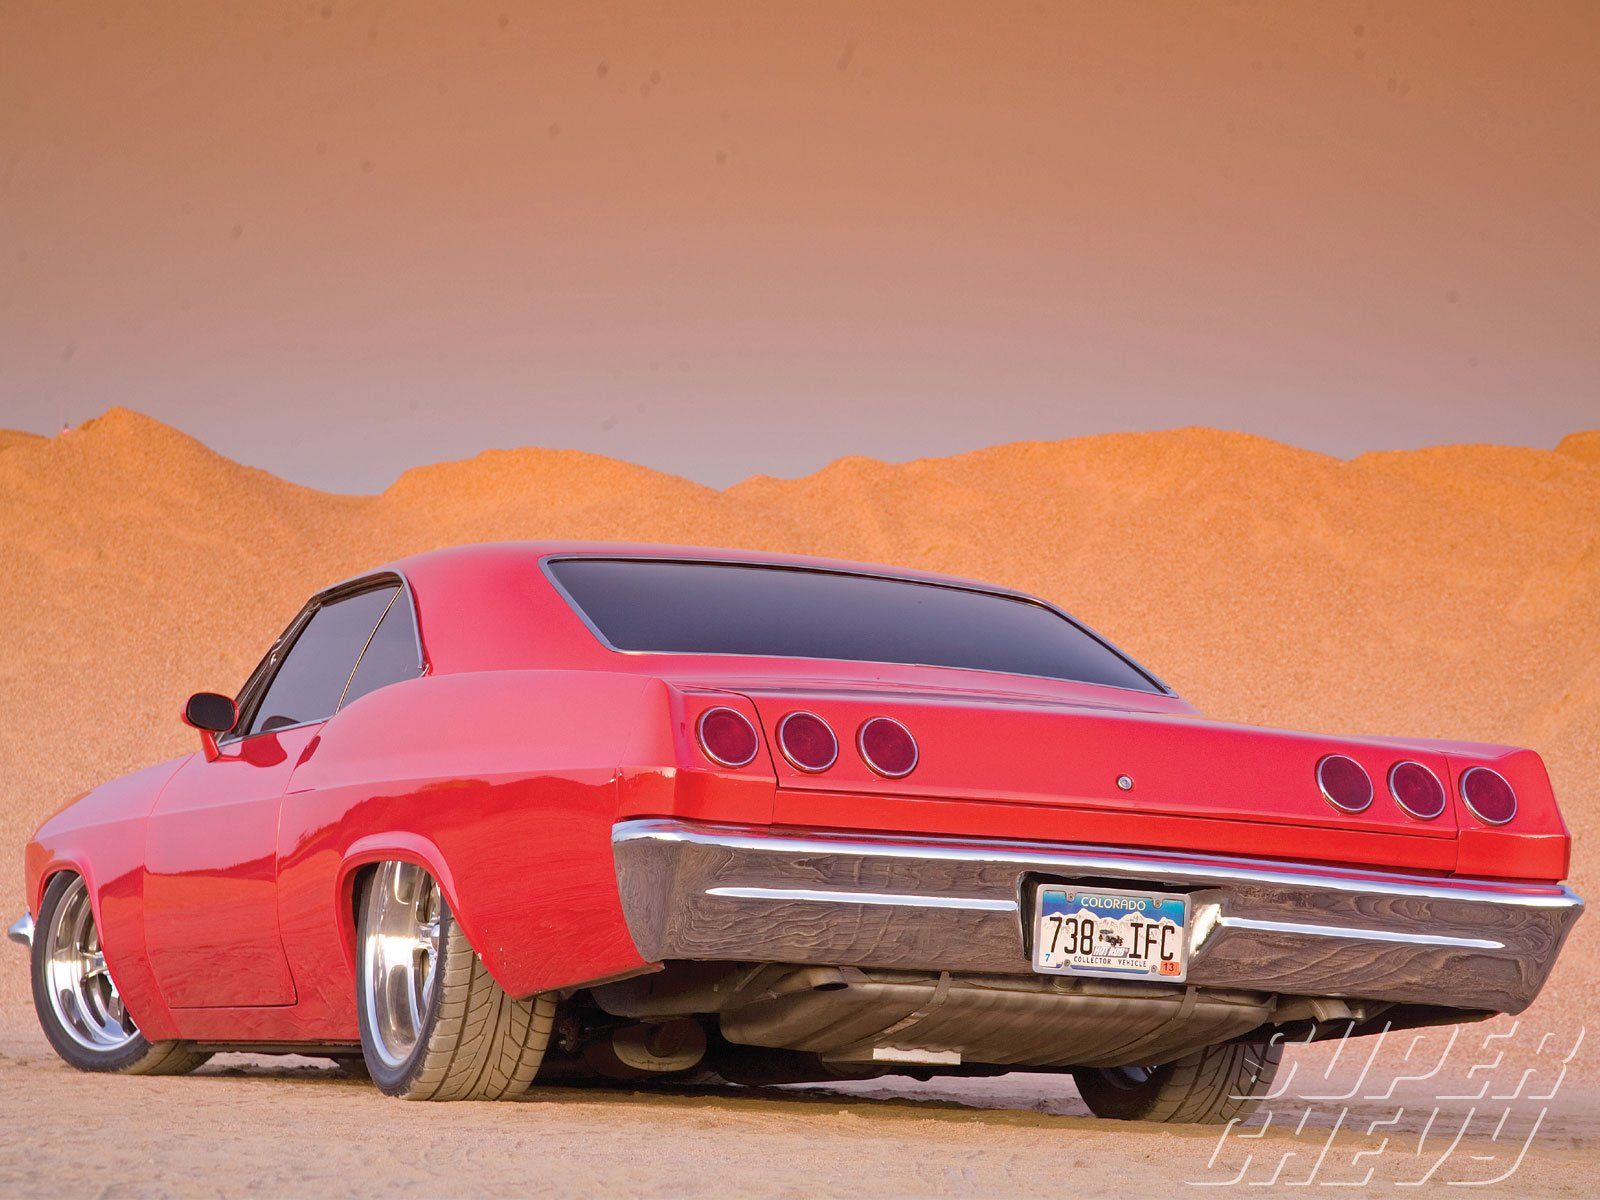 1965 Chevrolet Chevy Impala Ss Low Rider Street Machine Hi